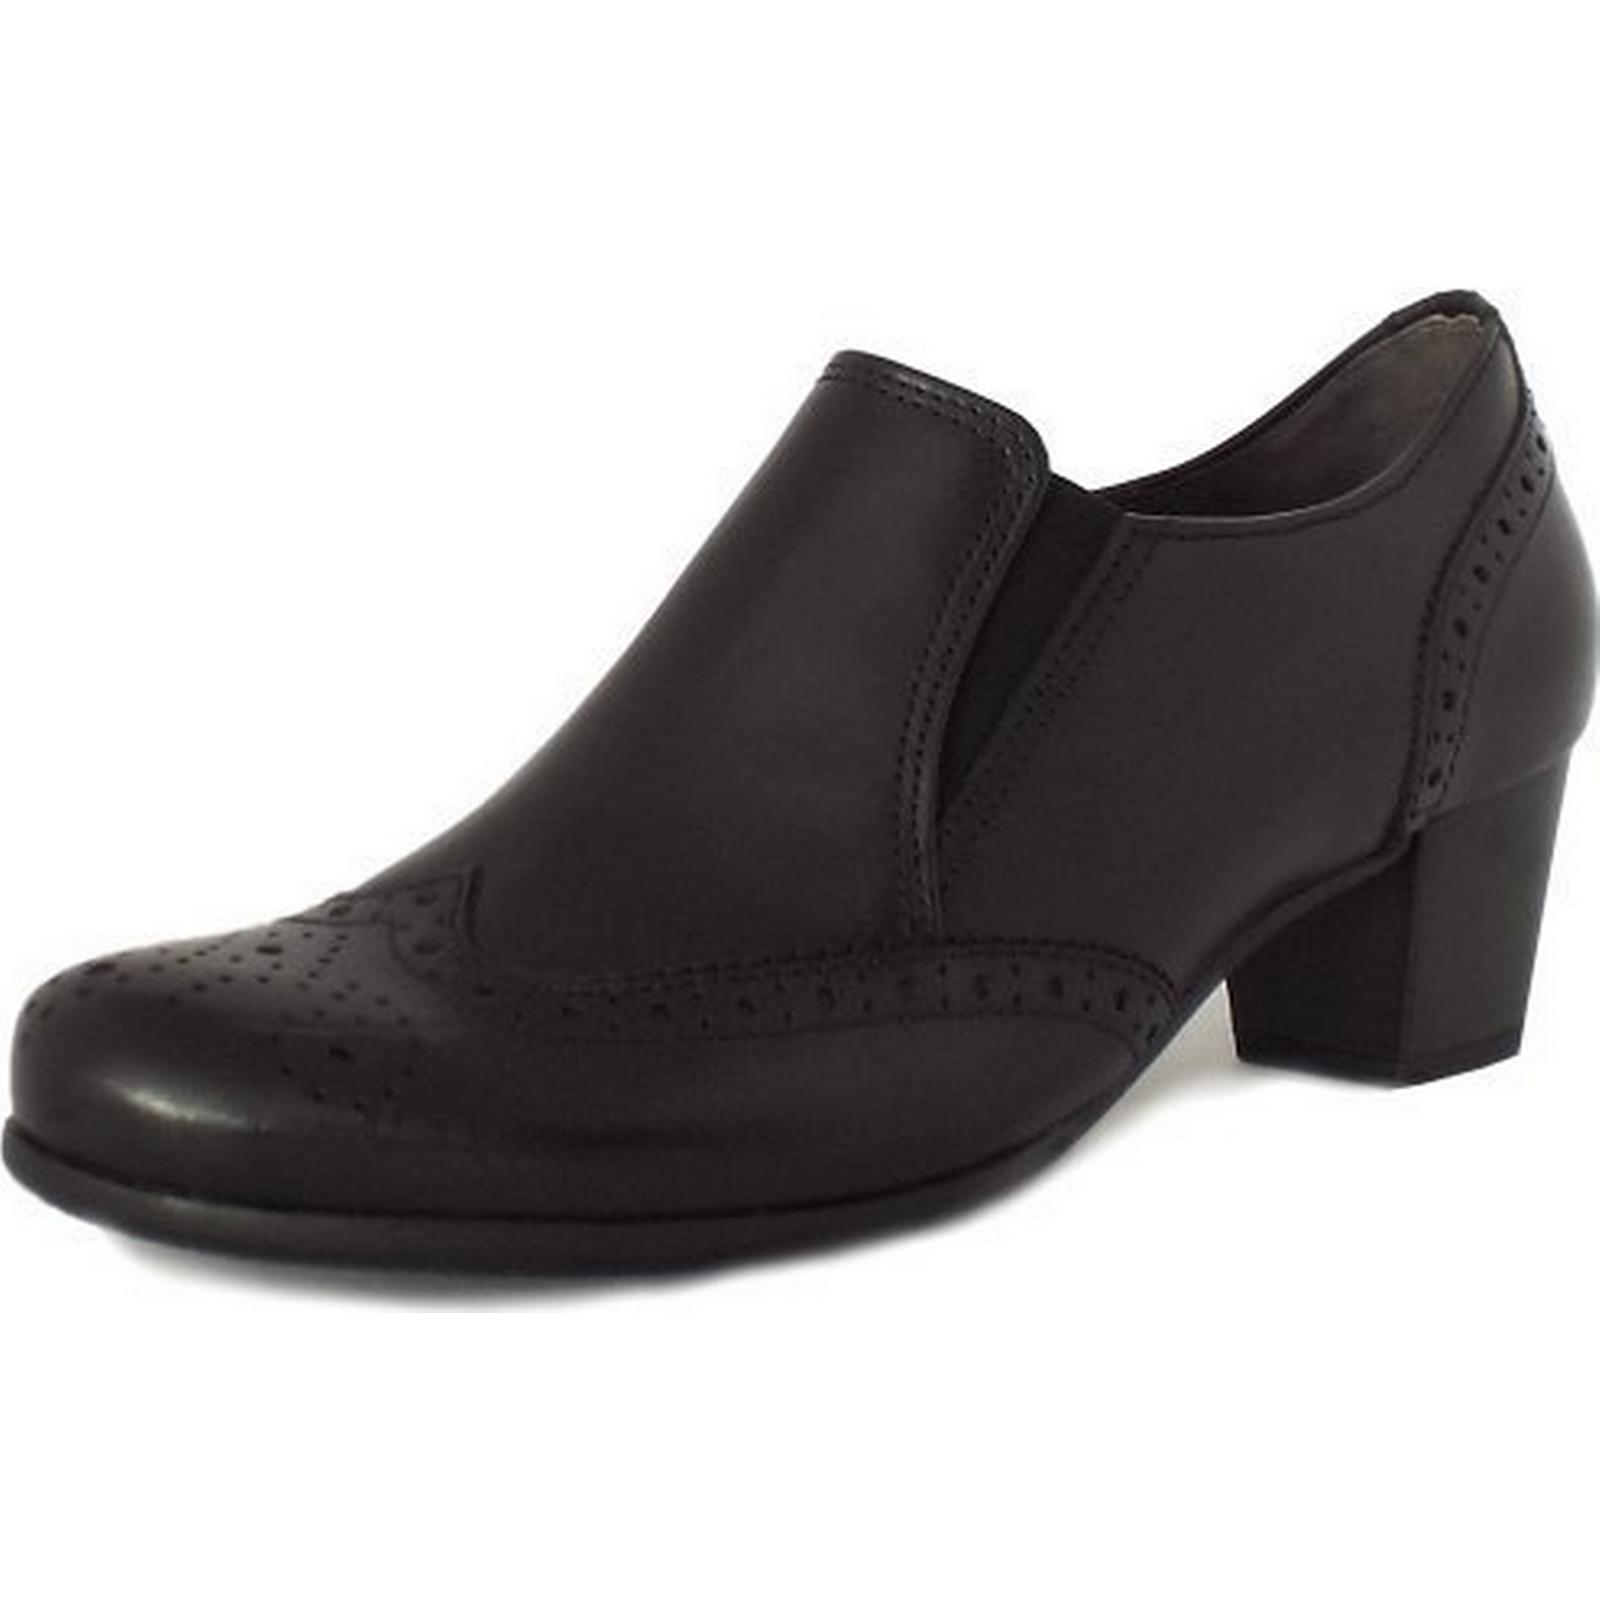 gabor attention gabor gabor gabor mesdames chaussures attention taille: 4.5, la couleur: noir 05f4c8